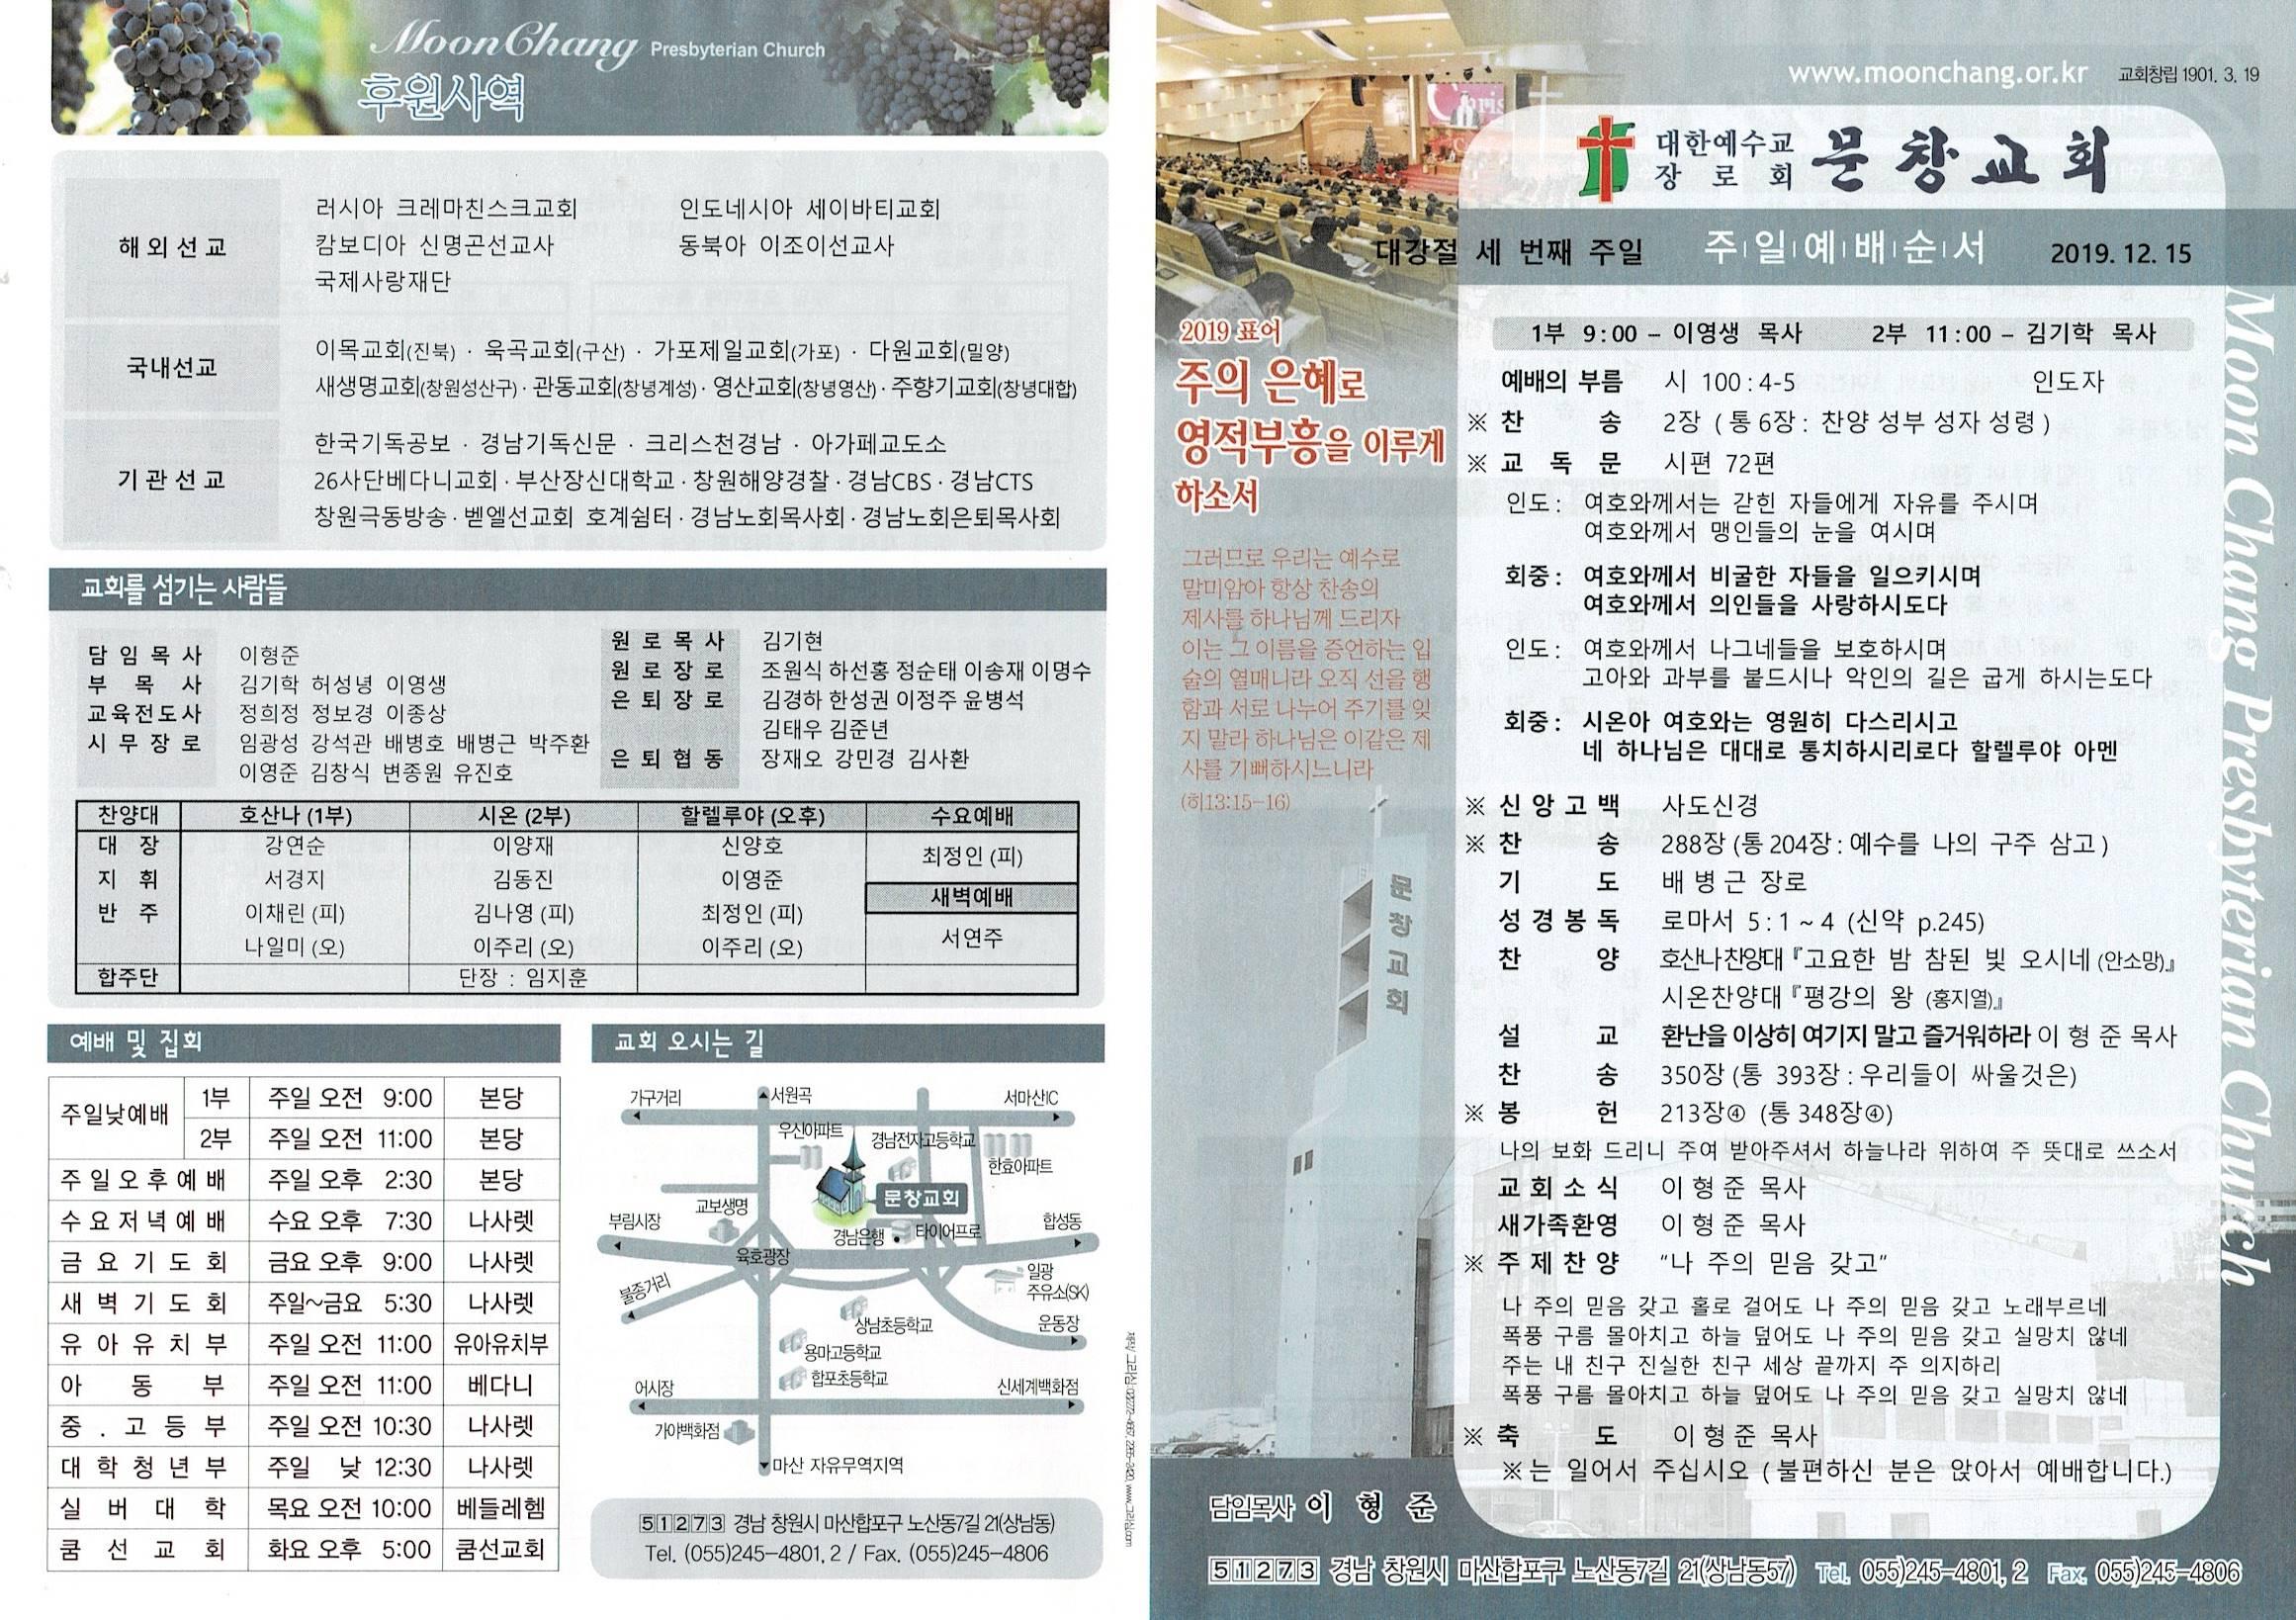 Scan2019-12-14_131404_000.jpg